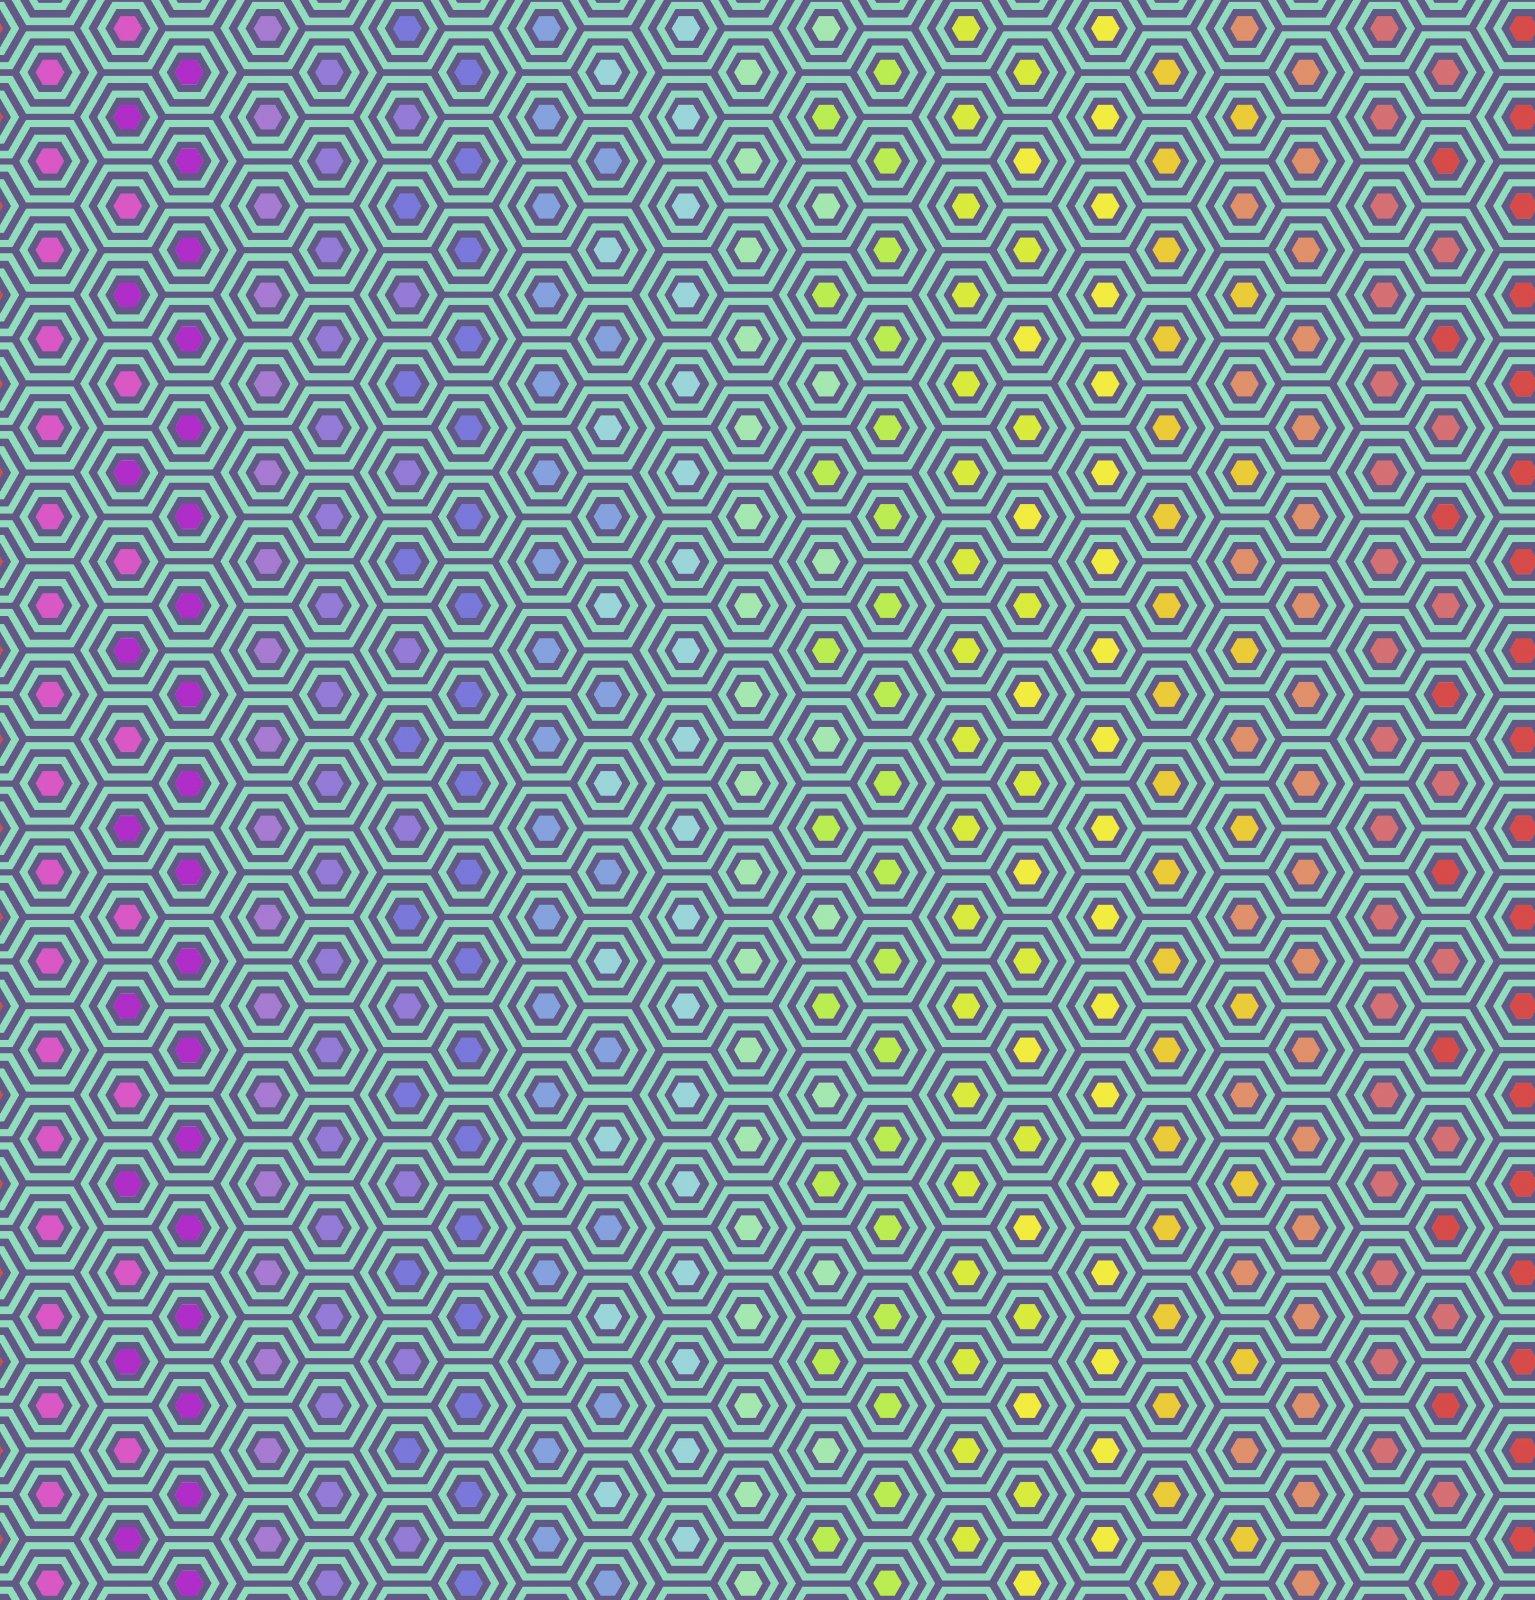 PWTP151.PEACOCK - Hexy Rainbow - Peacock